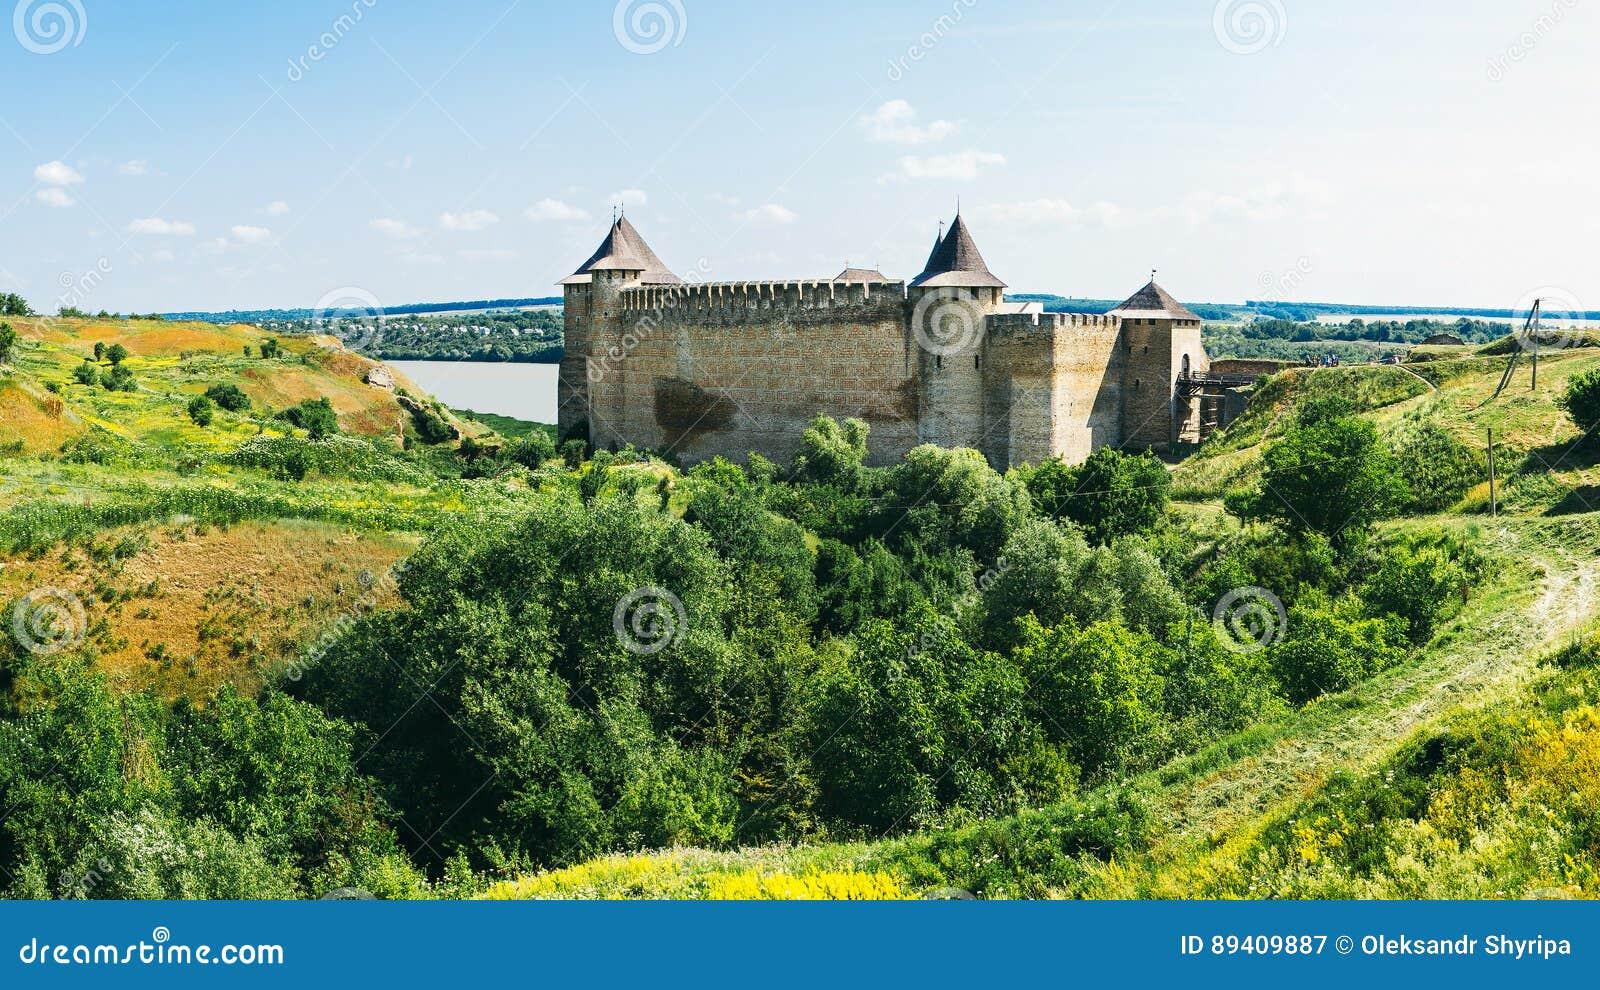 Fortaleza medieval na cidade Ucrânia ocidental de Khotyn